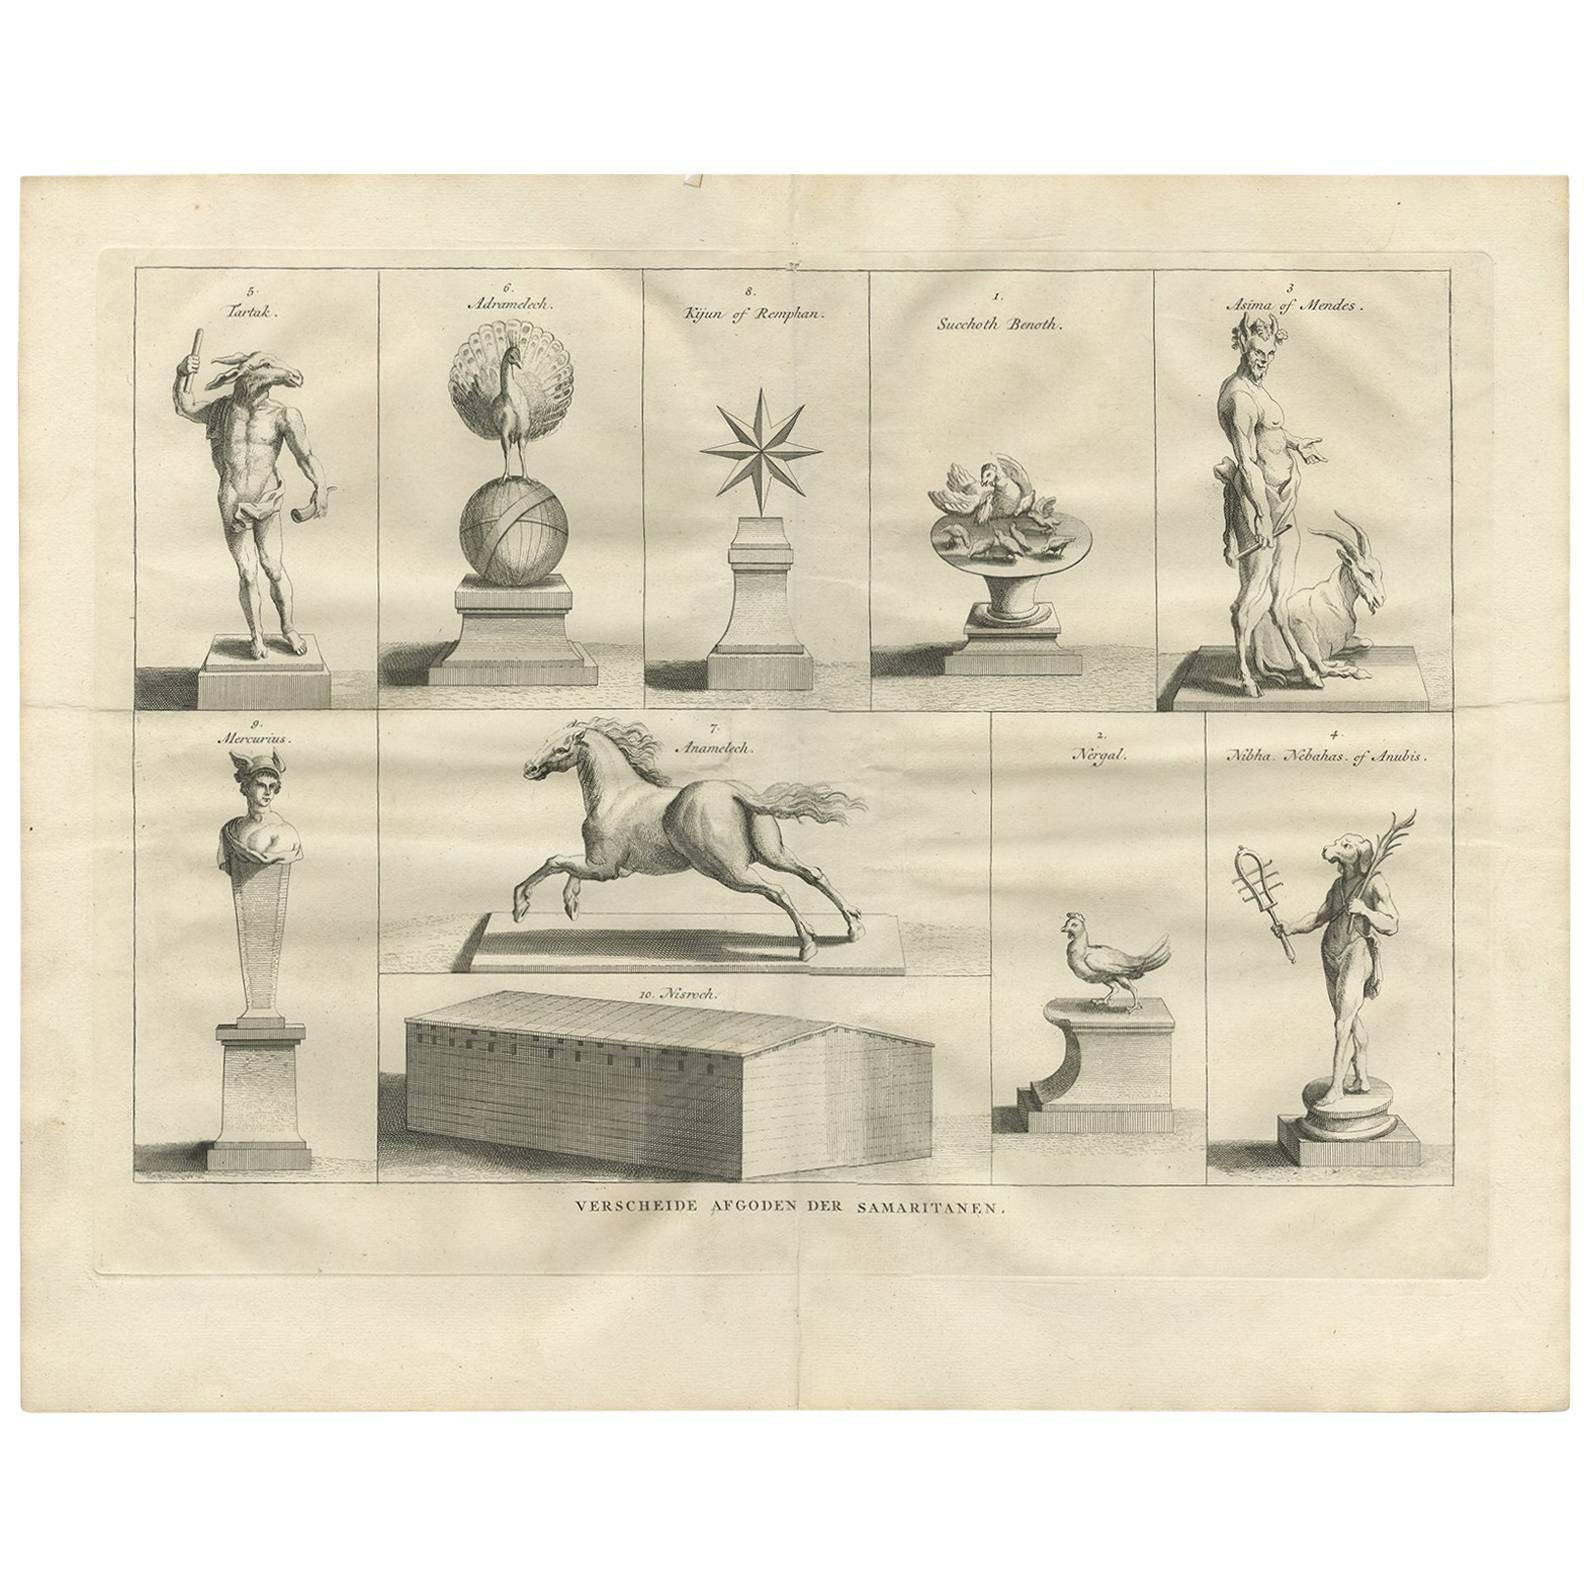 Antique Print of Various Deities of the Samaritans by A. Calmet, 1725